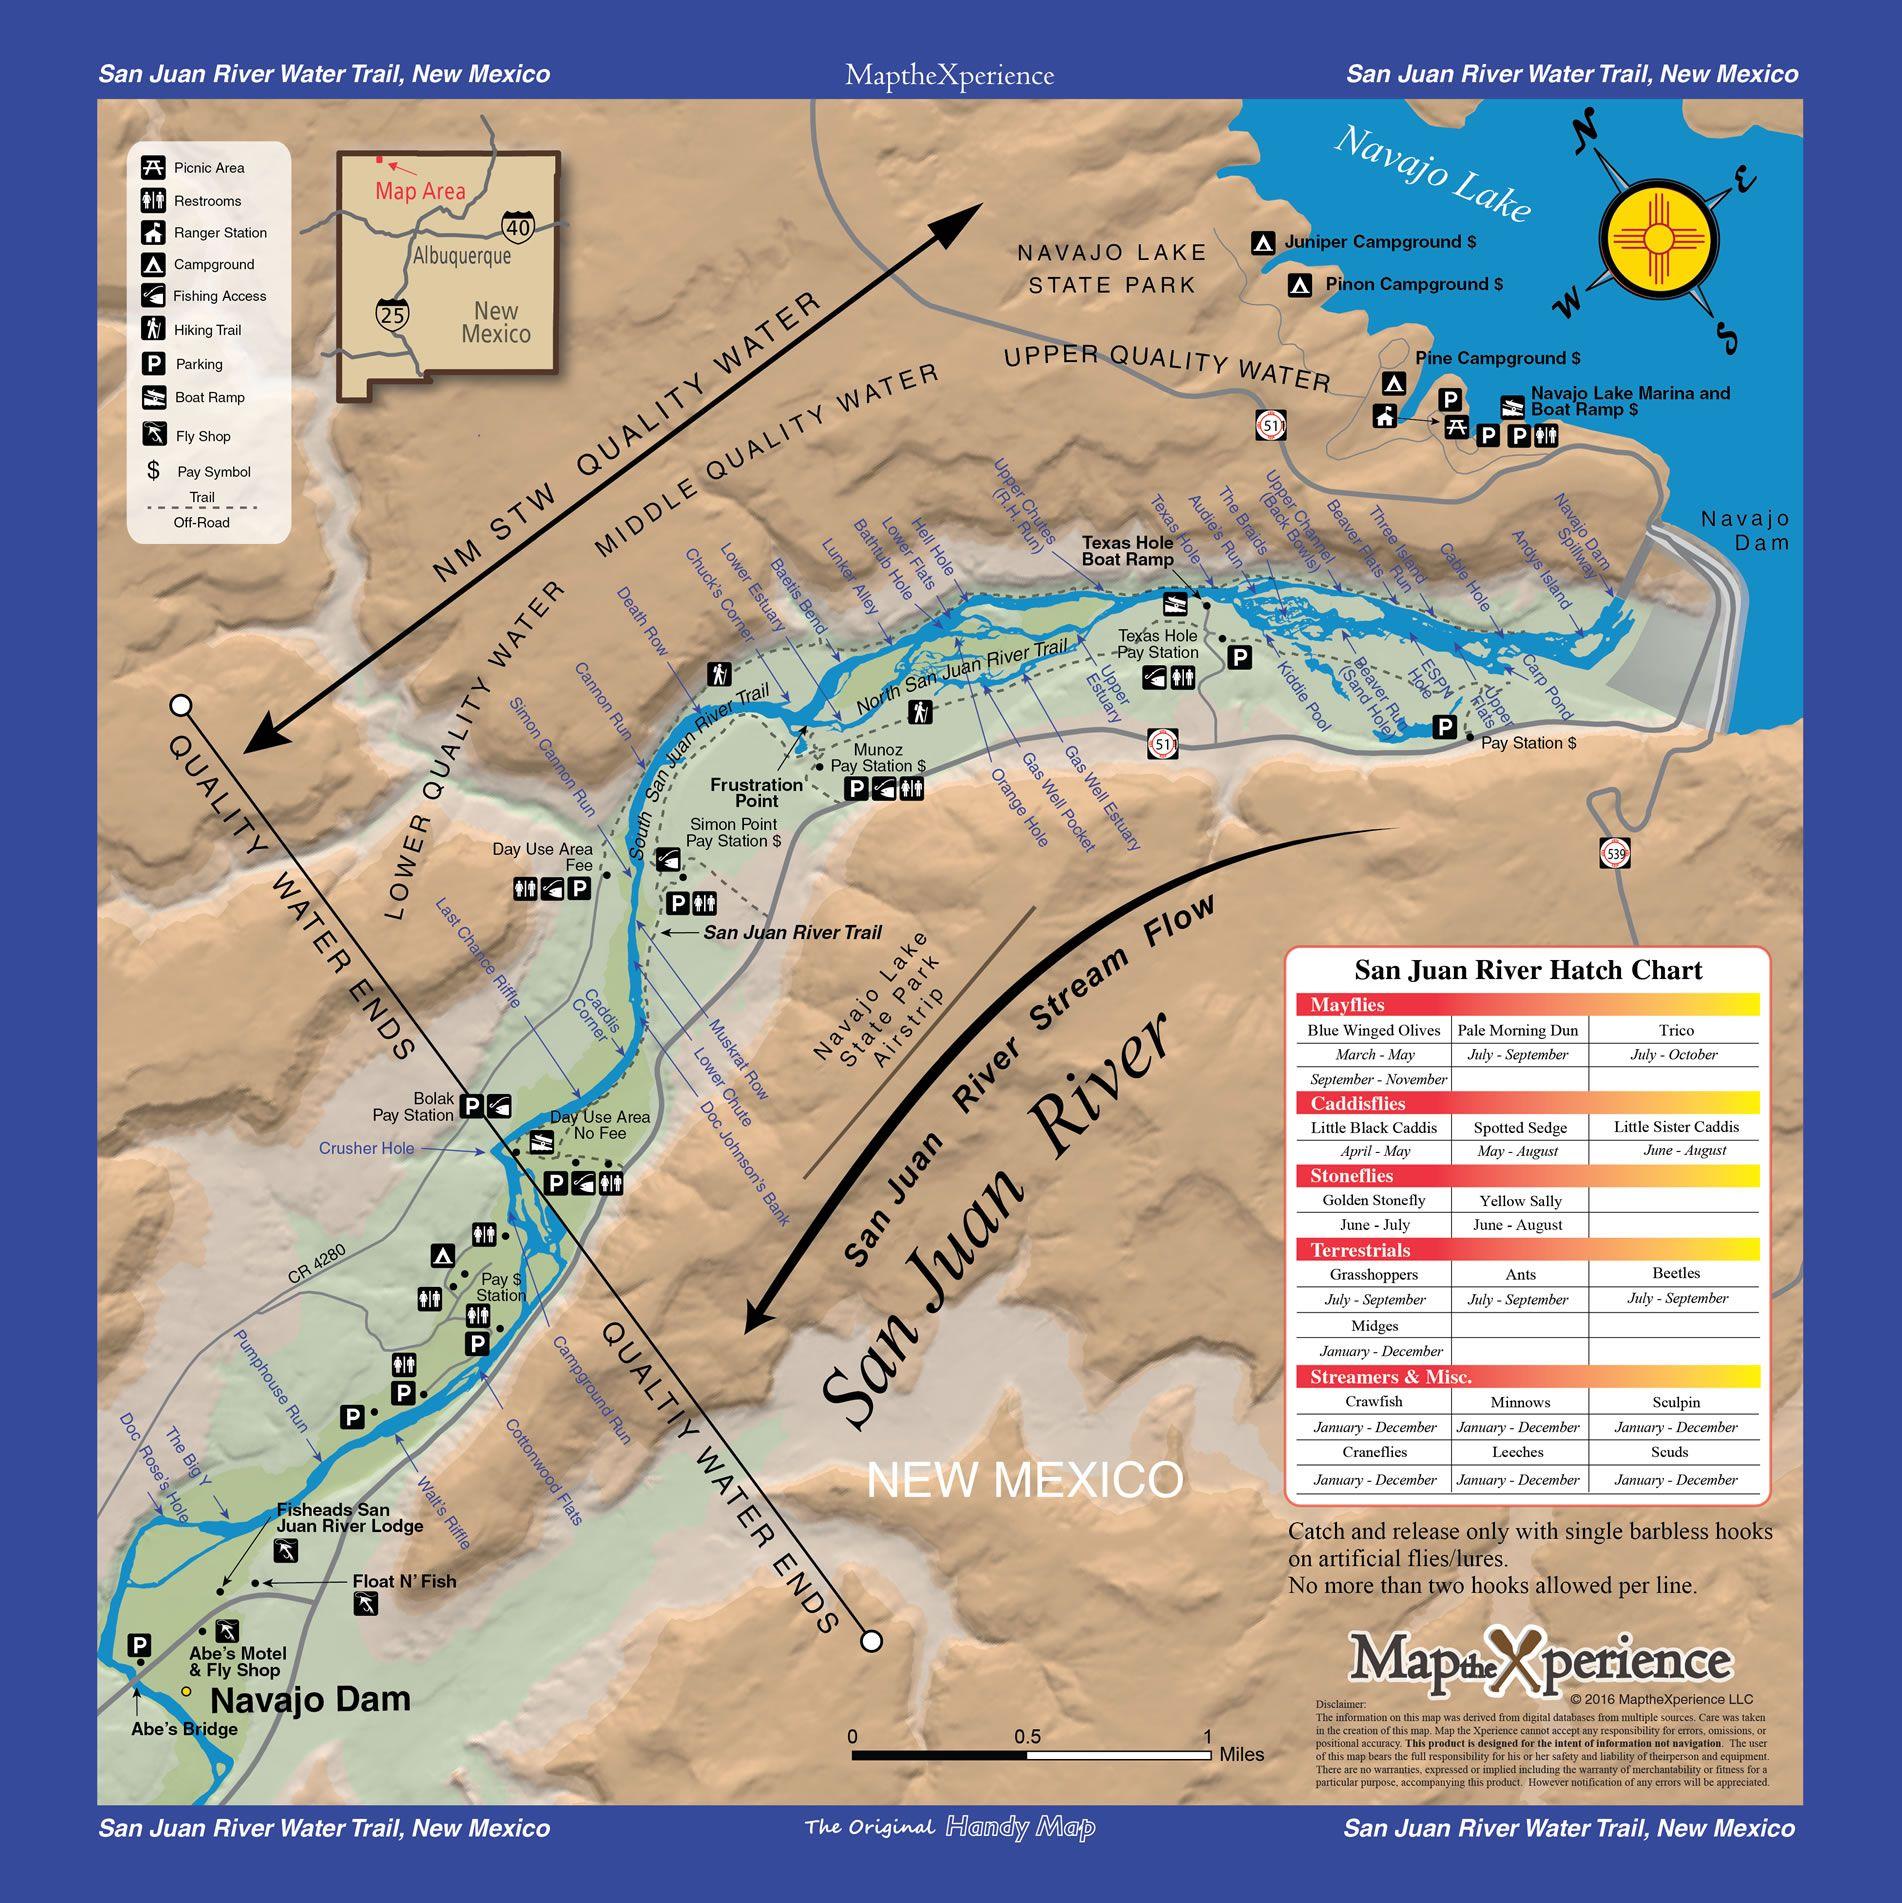 San Juan River Digital Gps Mobile Fishing Map Navajo Reservoir To Navajo Dam New Mexico Fishing Maps Lake Water New Mexico